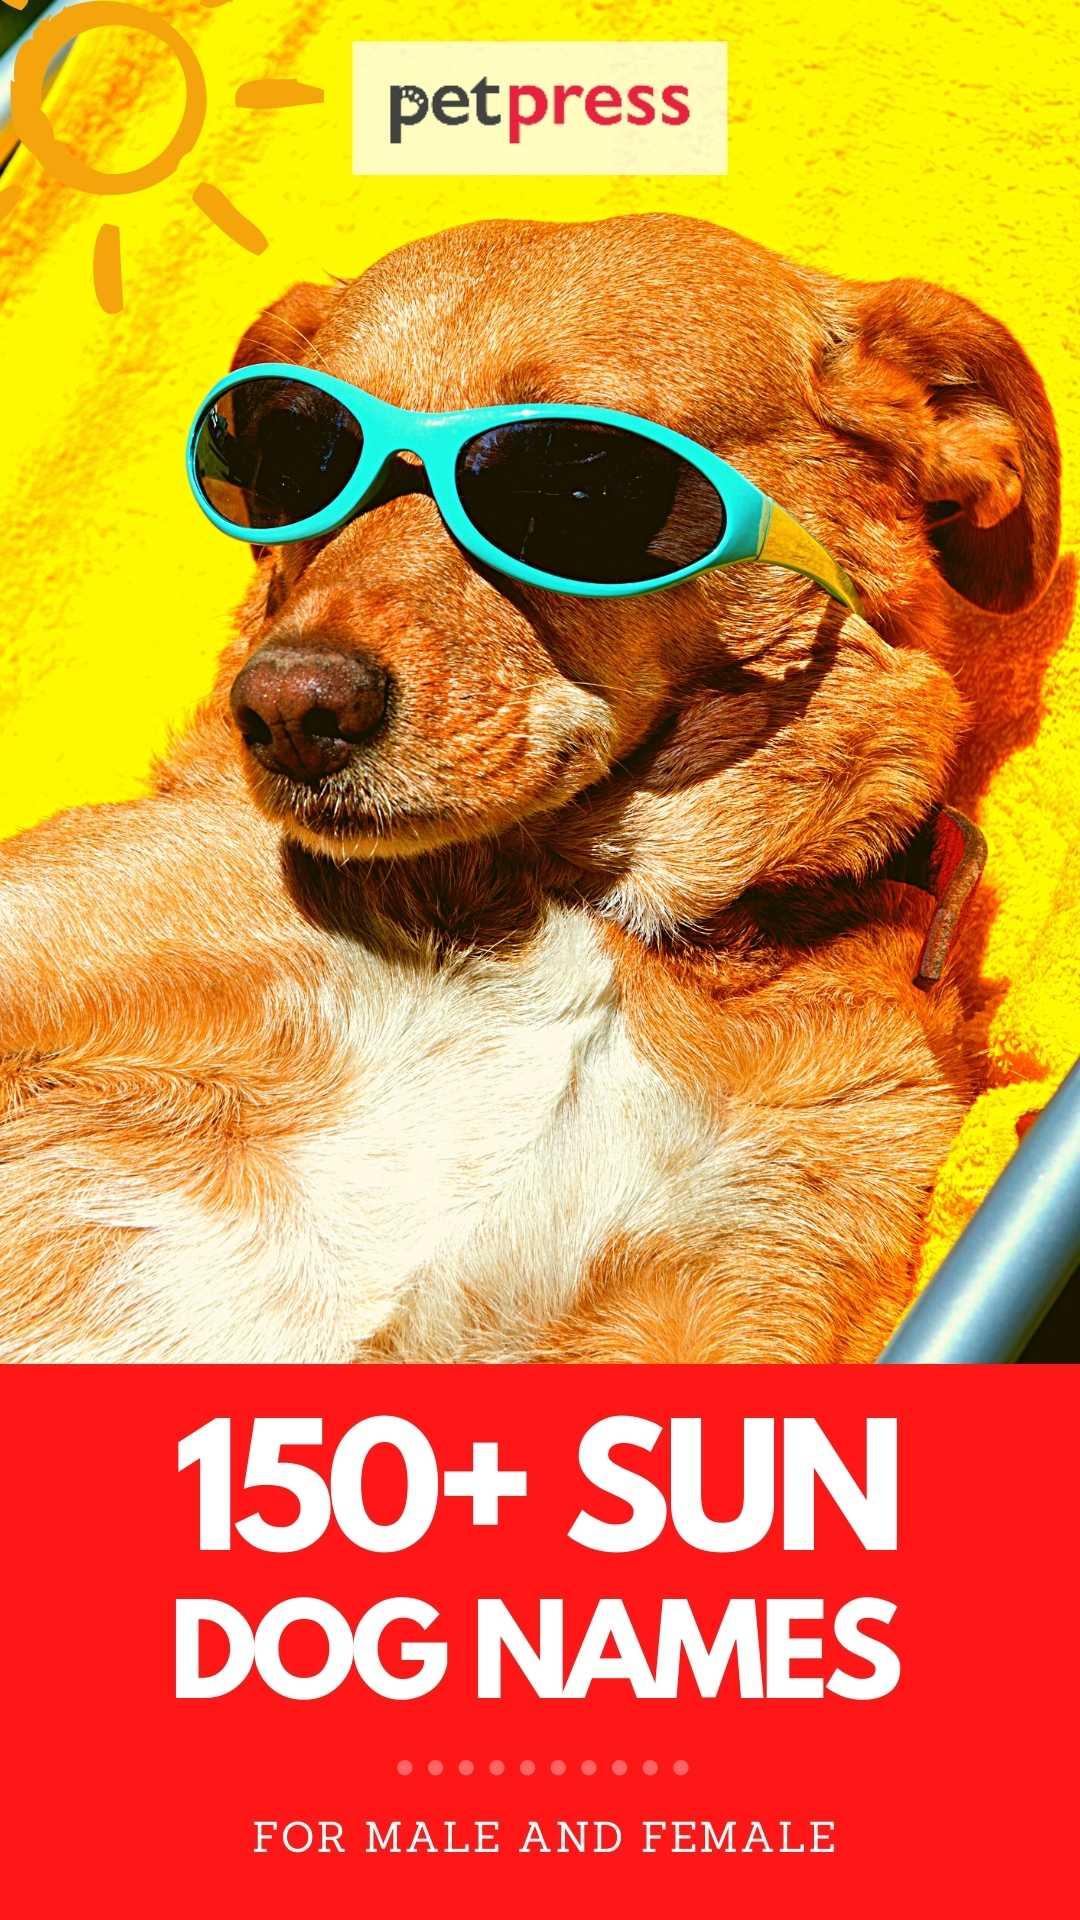 sun dog names for naming a dog